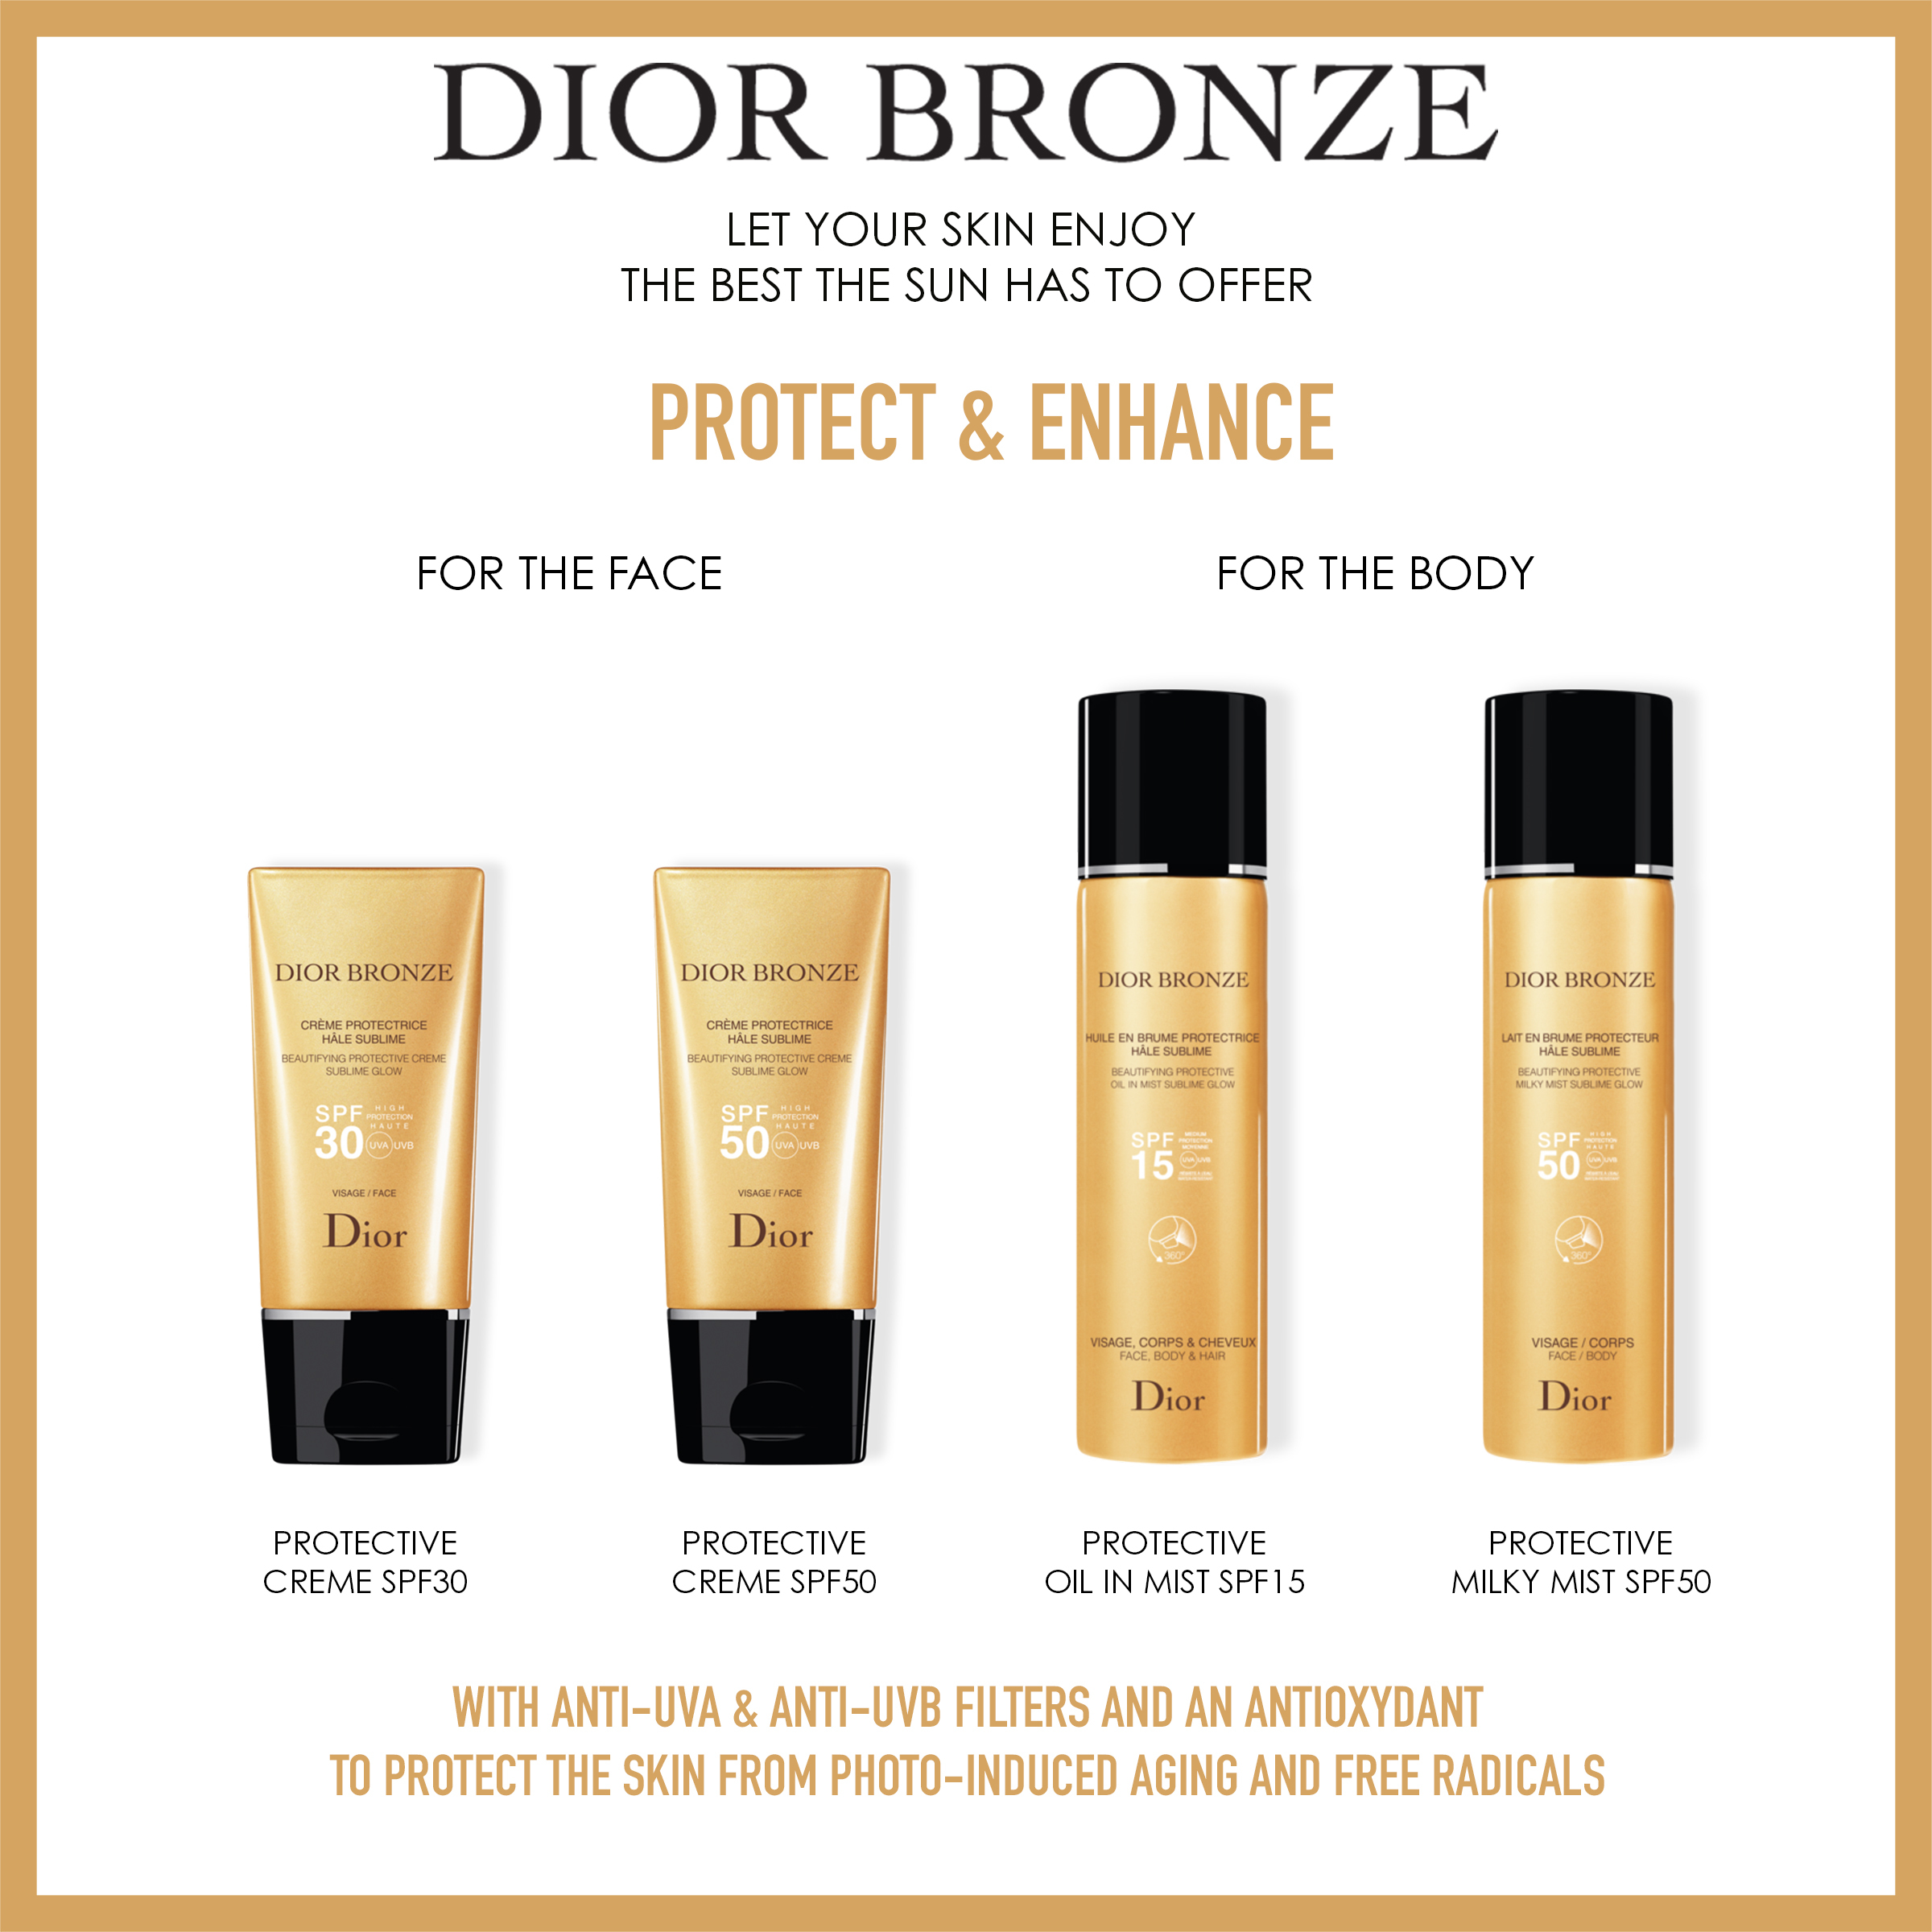 Diorbronze Face Protect Creme SPF30 50ml